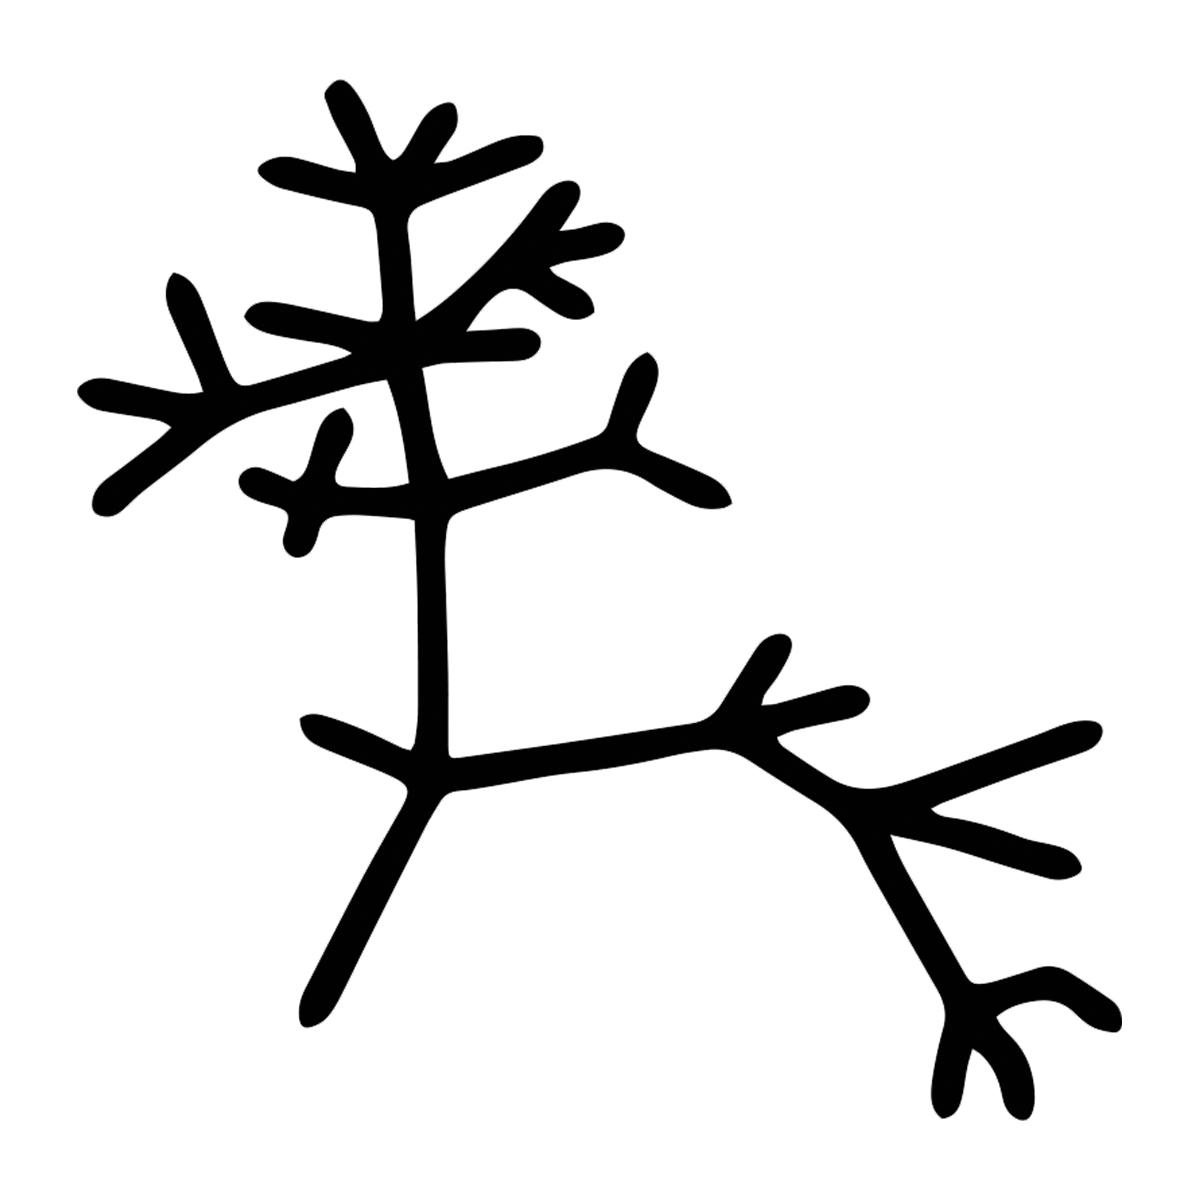 Darwin Tree Of Life Outline Vinyl Decal